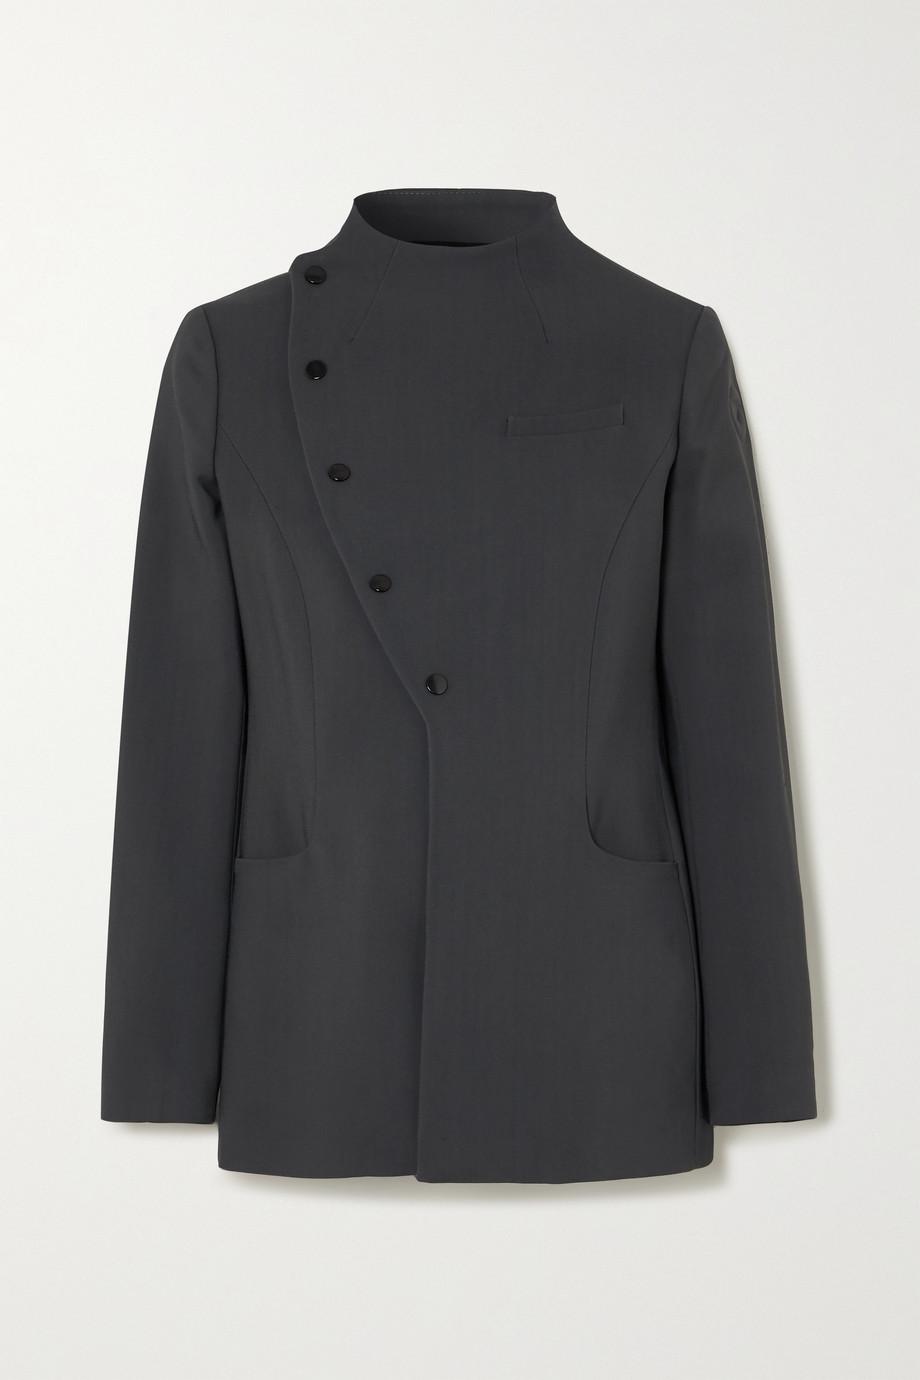 Coperni Asymmetrische Jacke aus Webstoff